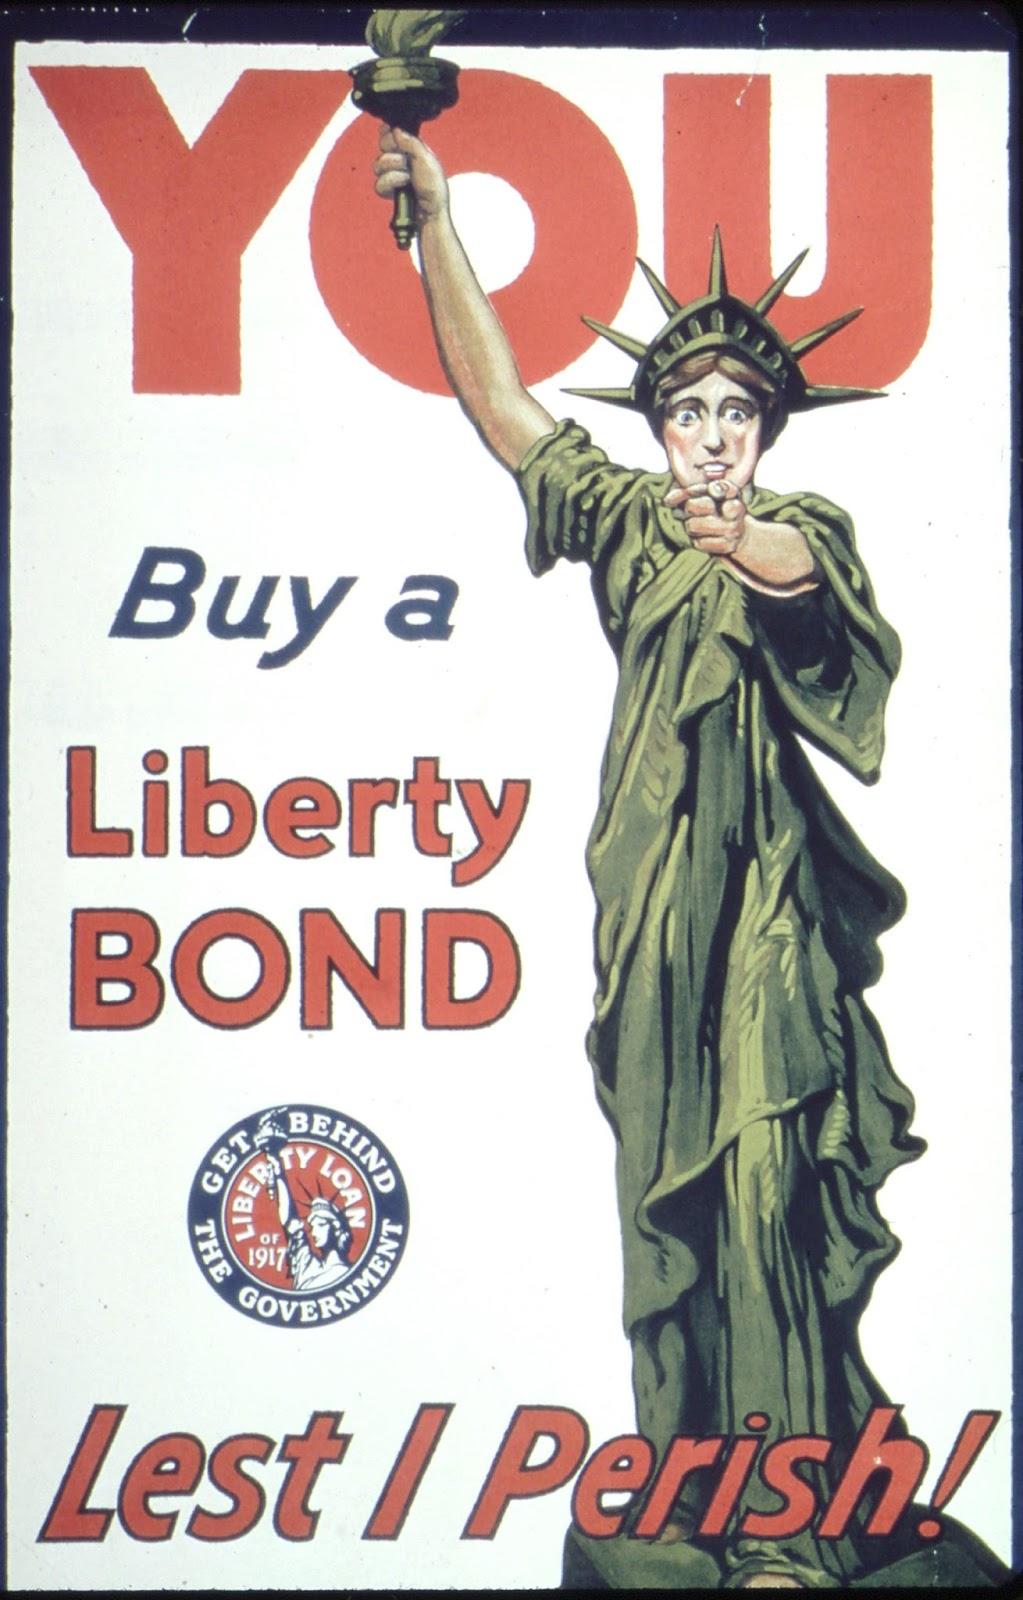 WW1 USA 1917 You, Buy a Liberty Bond, Lest I Perish